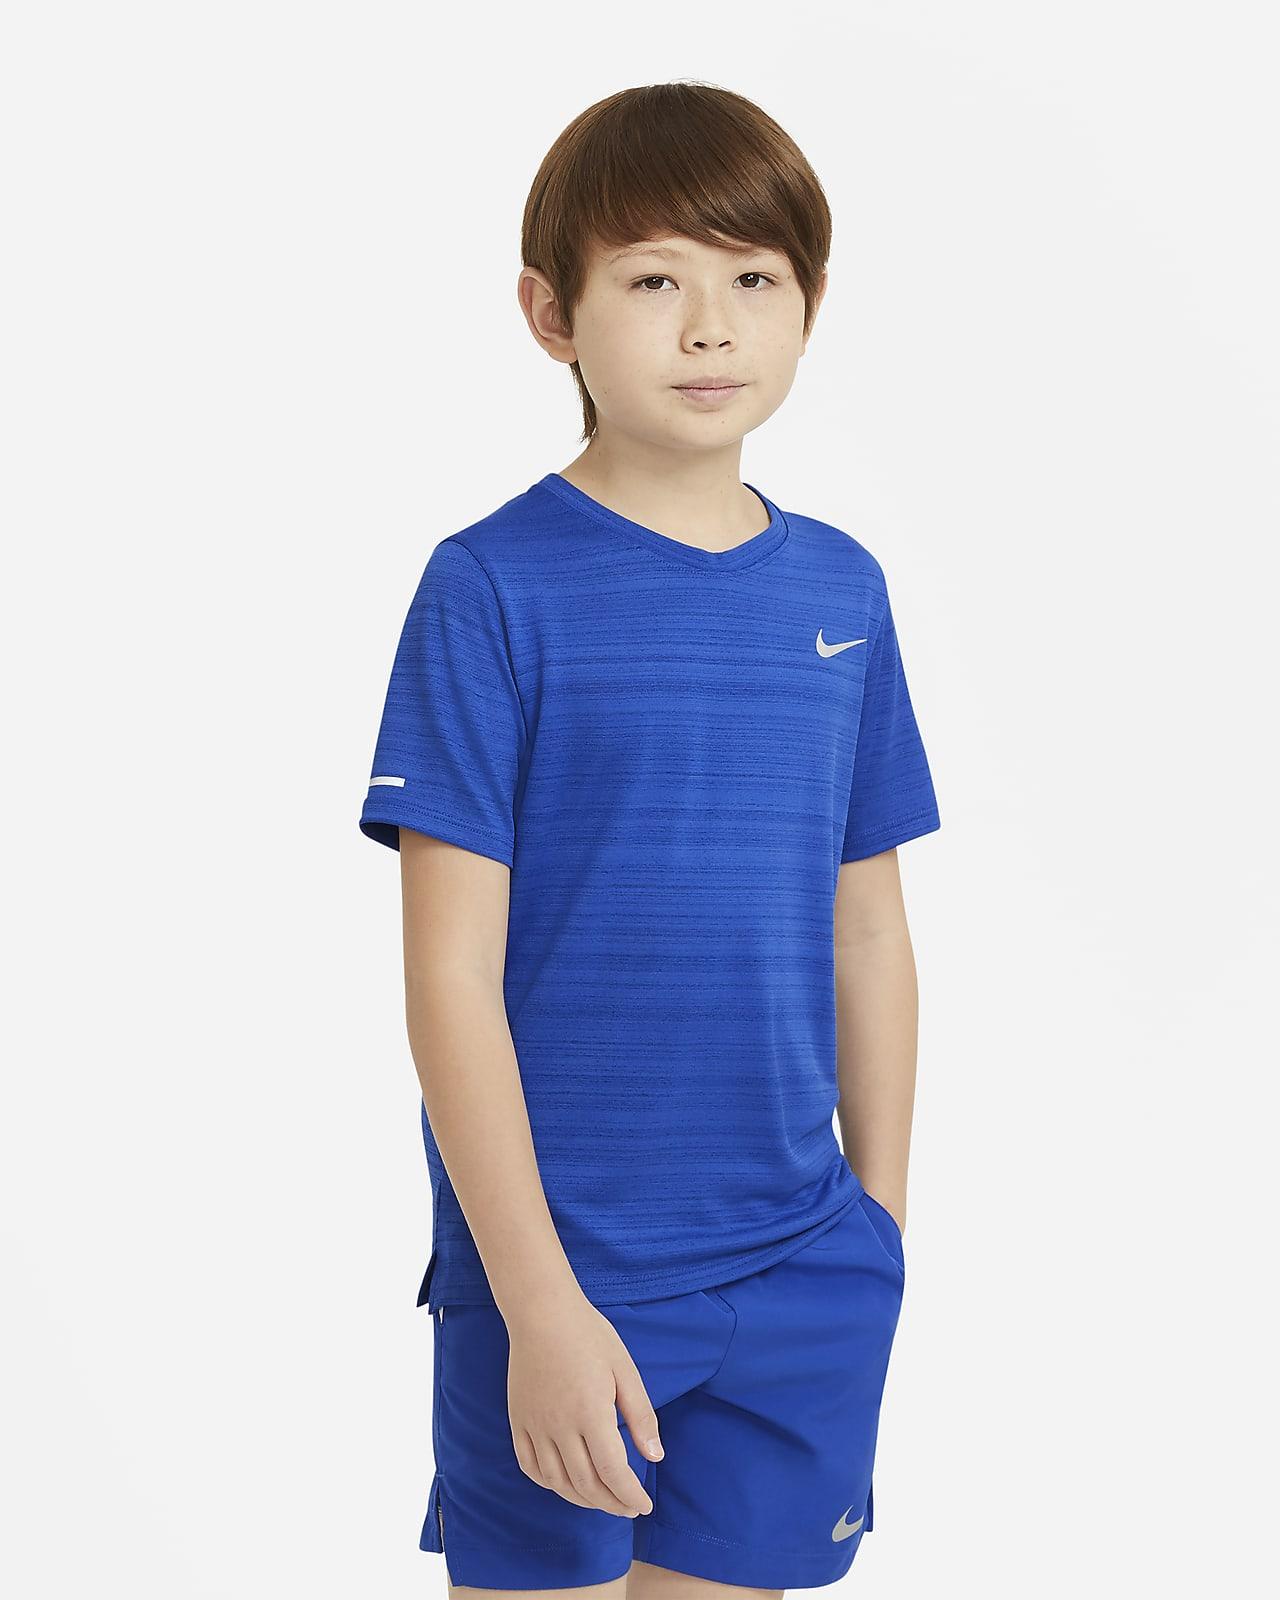 Camisola de treino Nike Dri-FIT Miler Júnior (Rapaz)